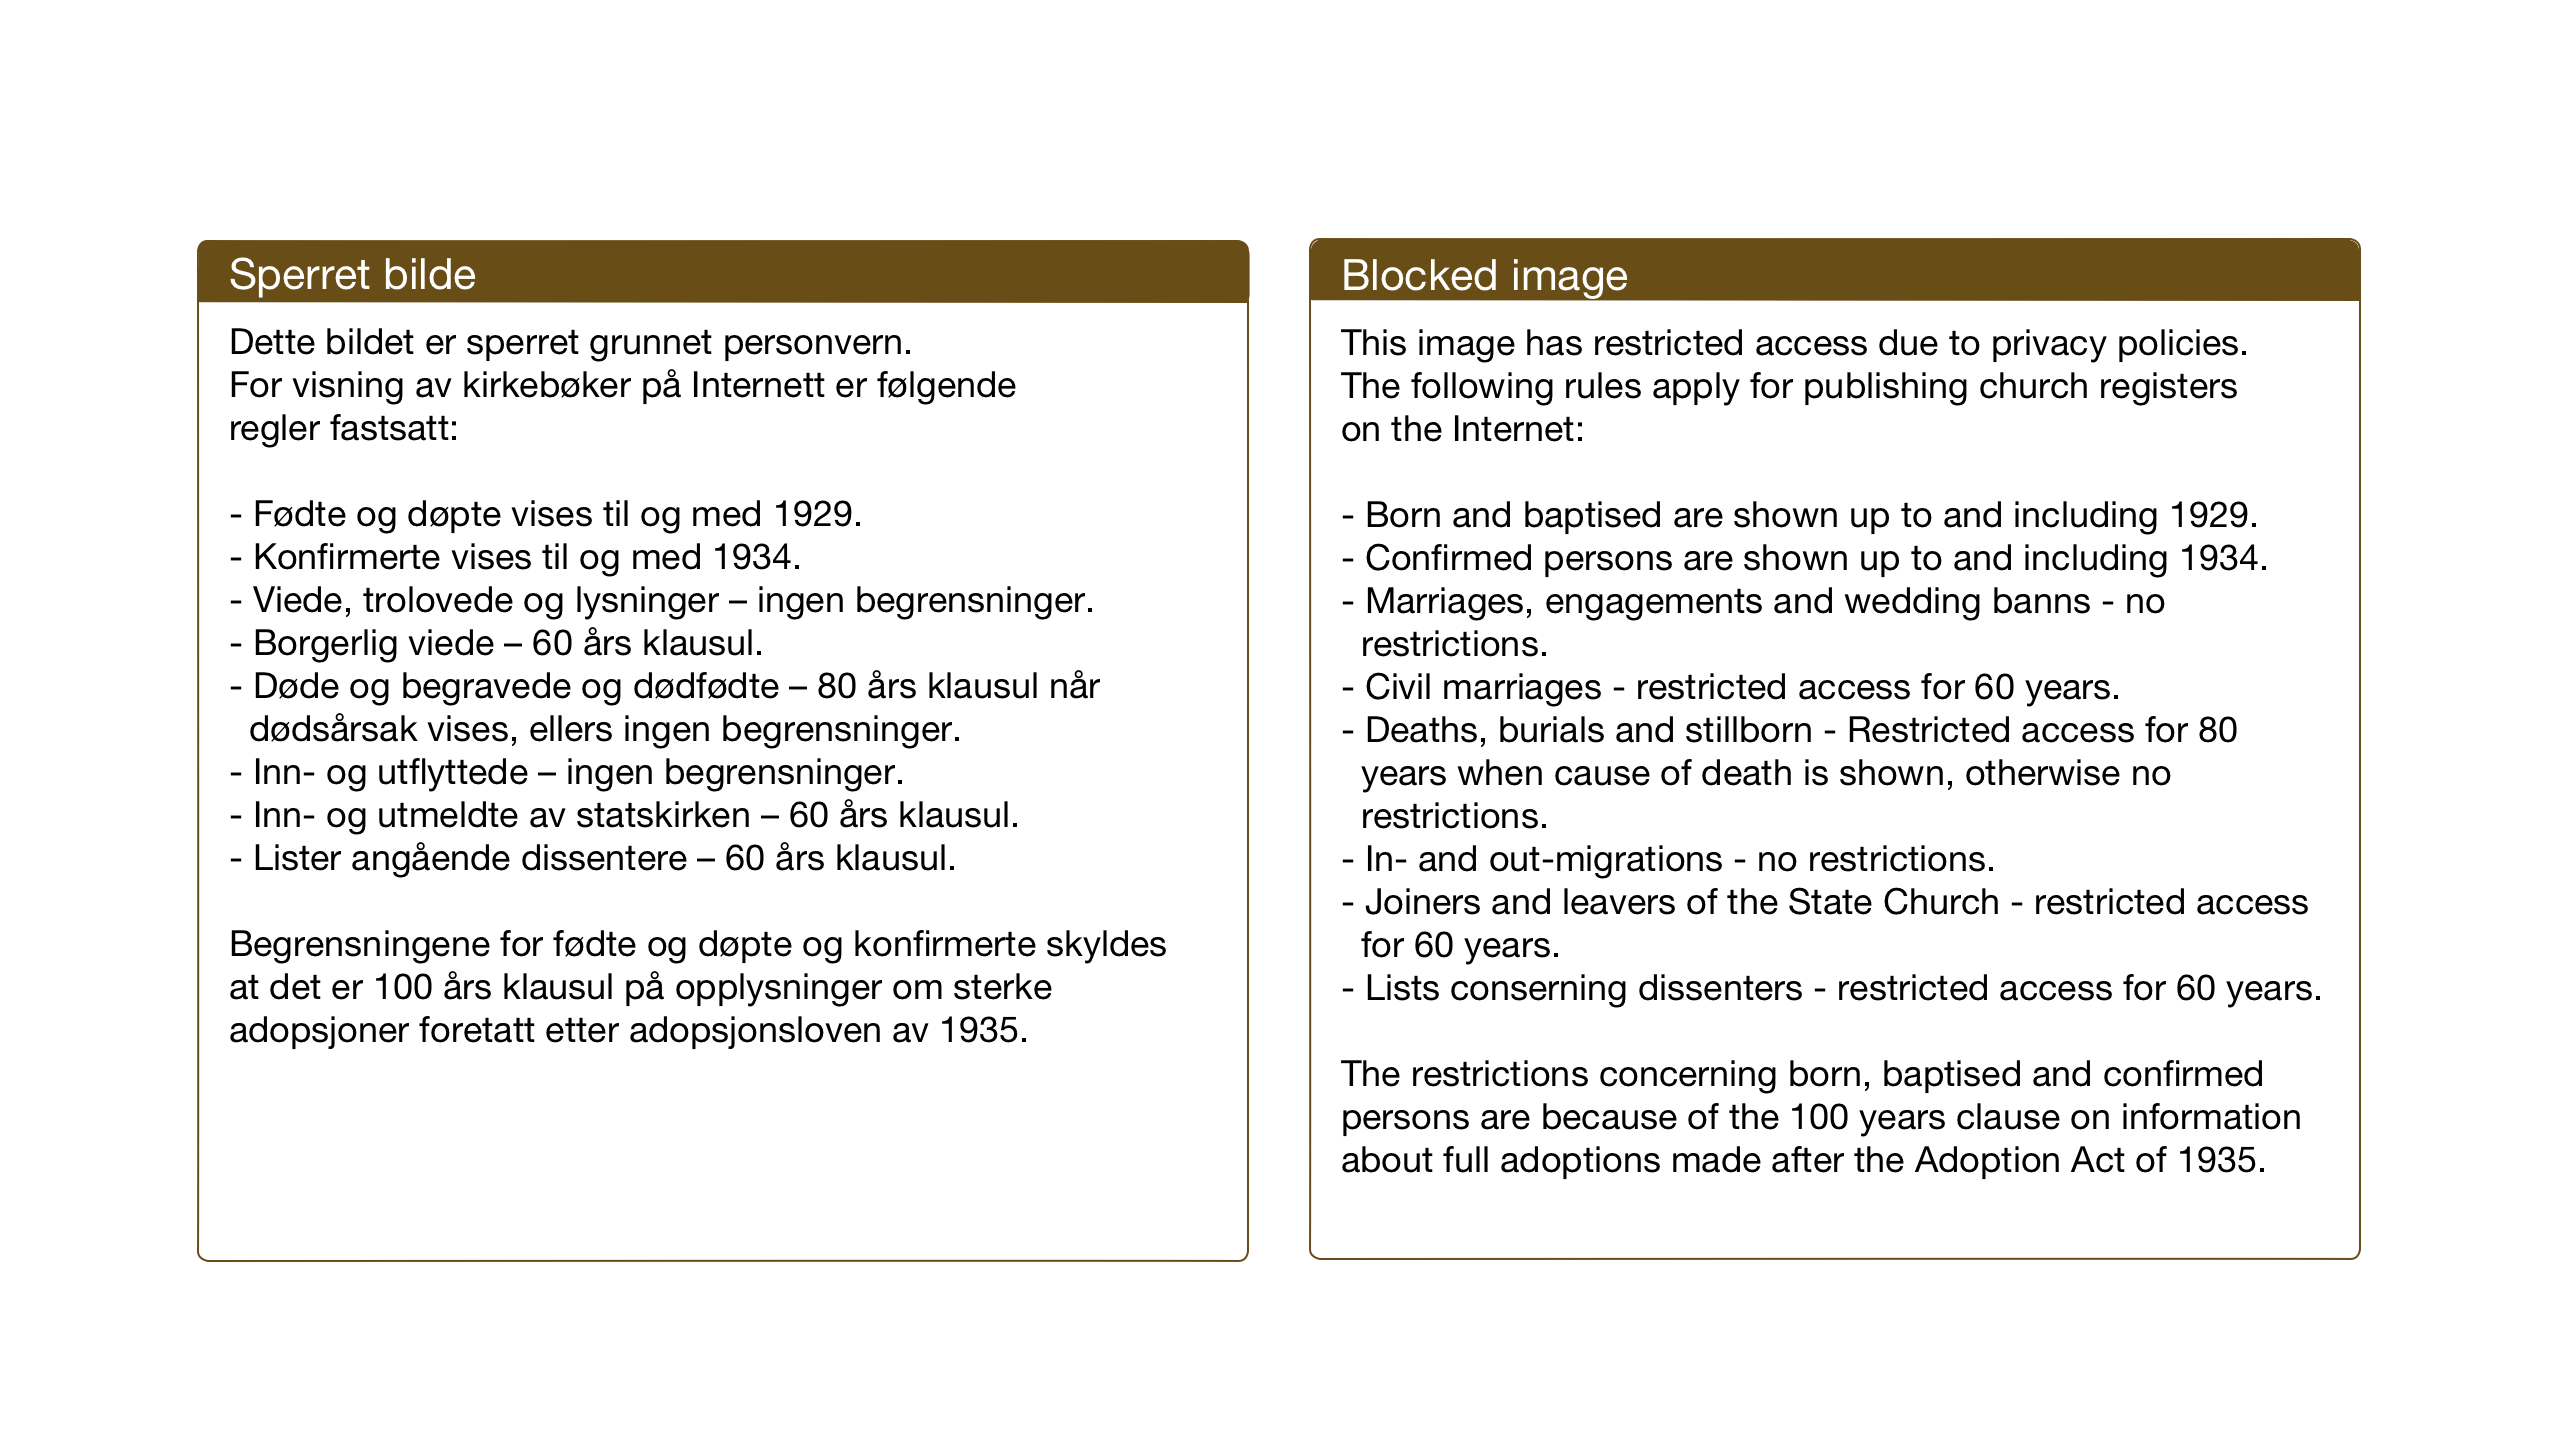 SAH, Vardal prestekontor, H/Ha/Haa/L0018: Ministerialbok nr. 18, 1930-1945, s. 15